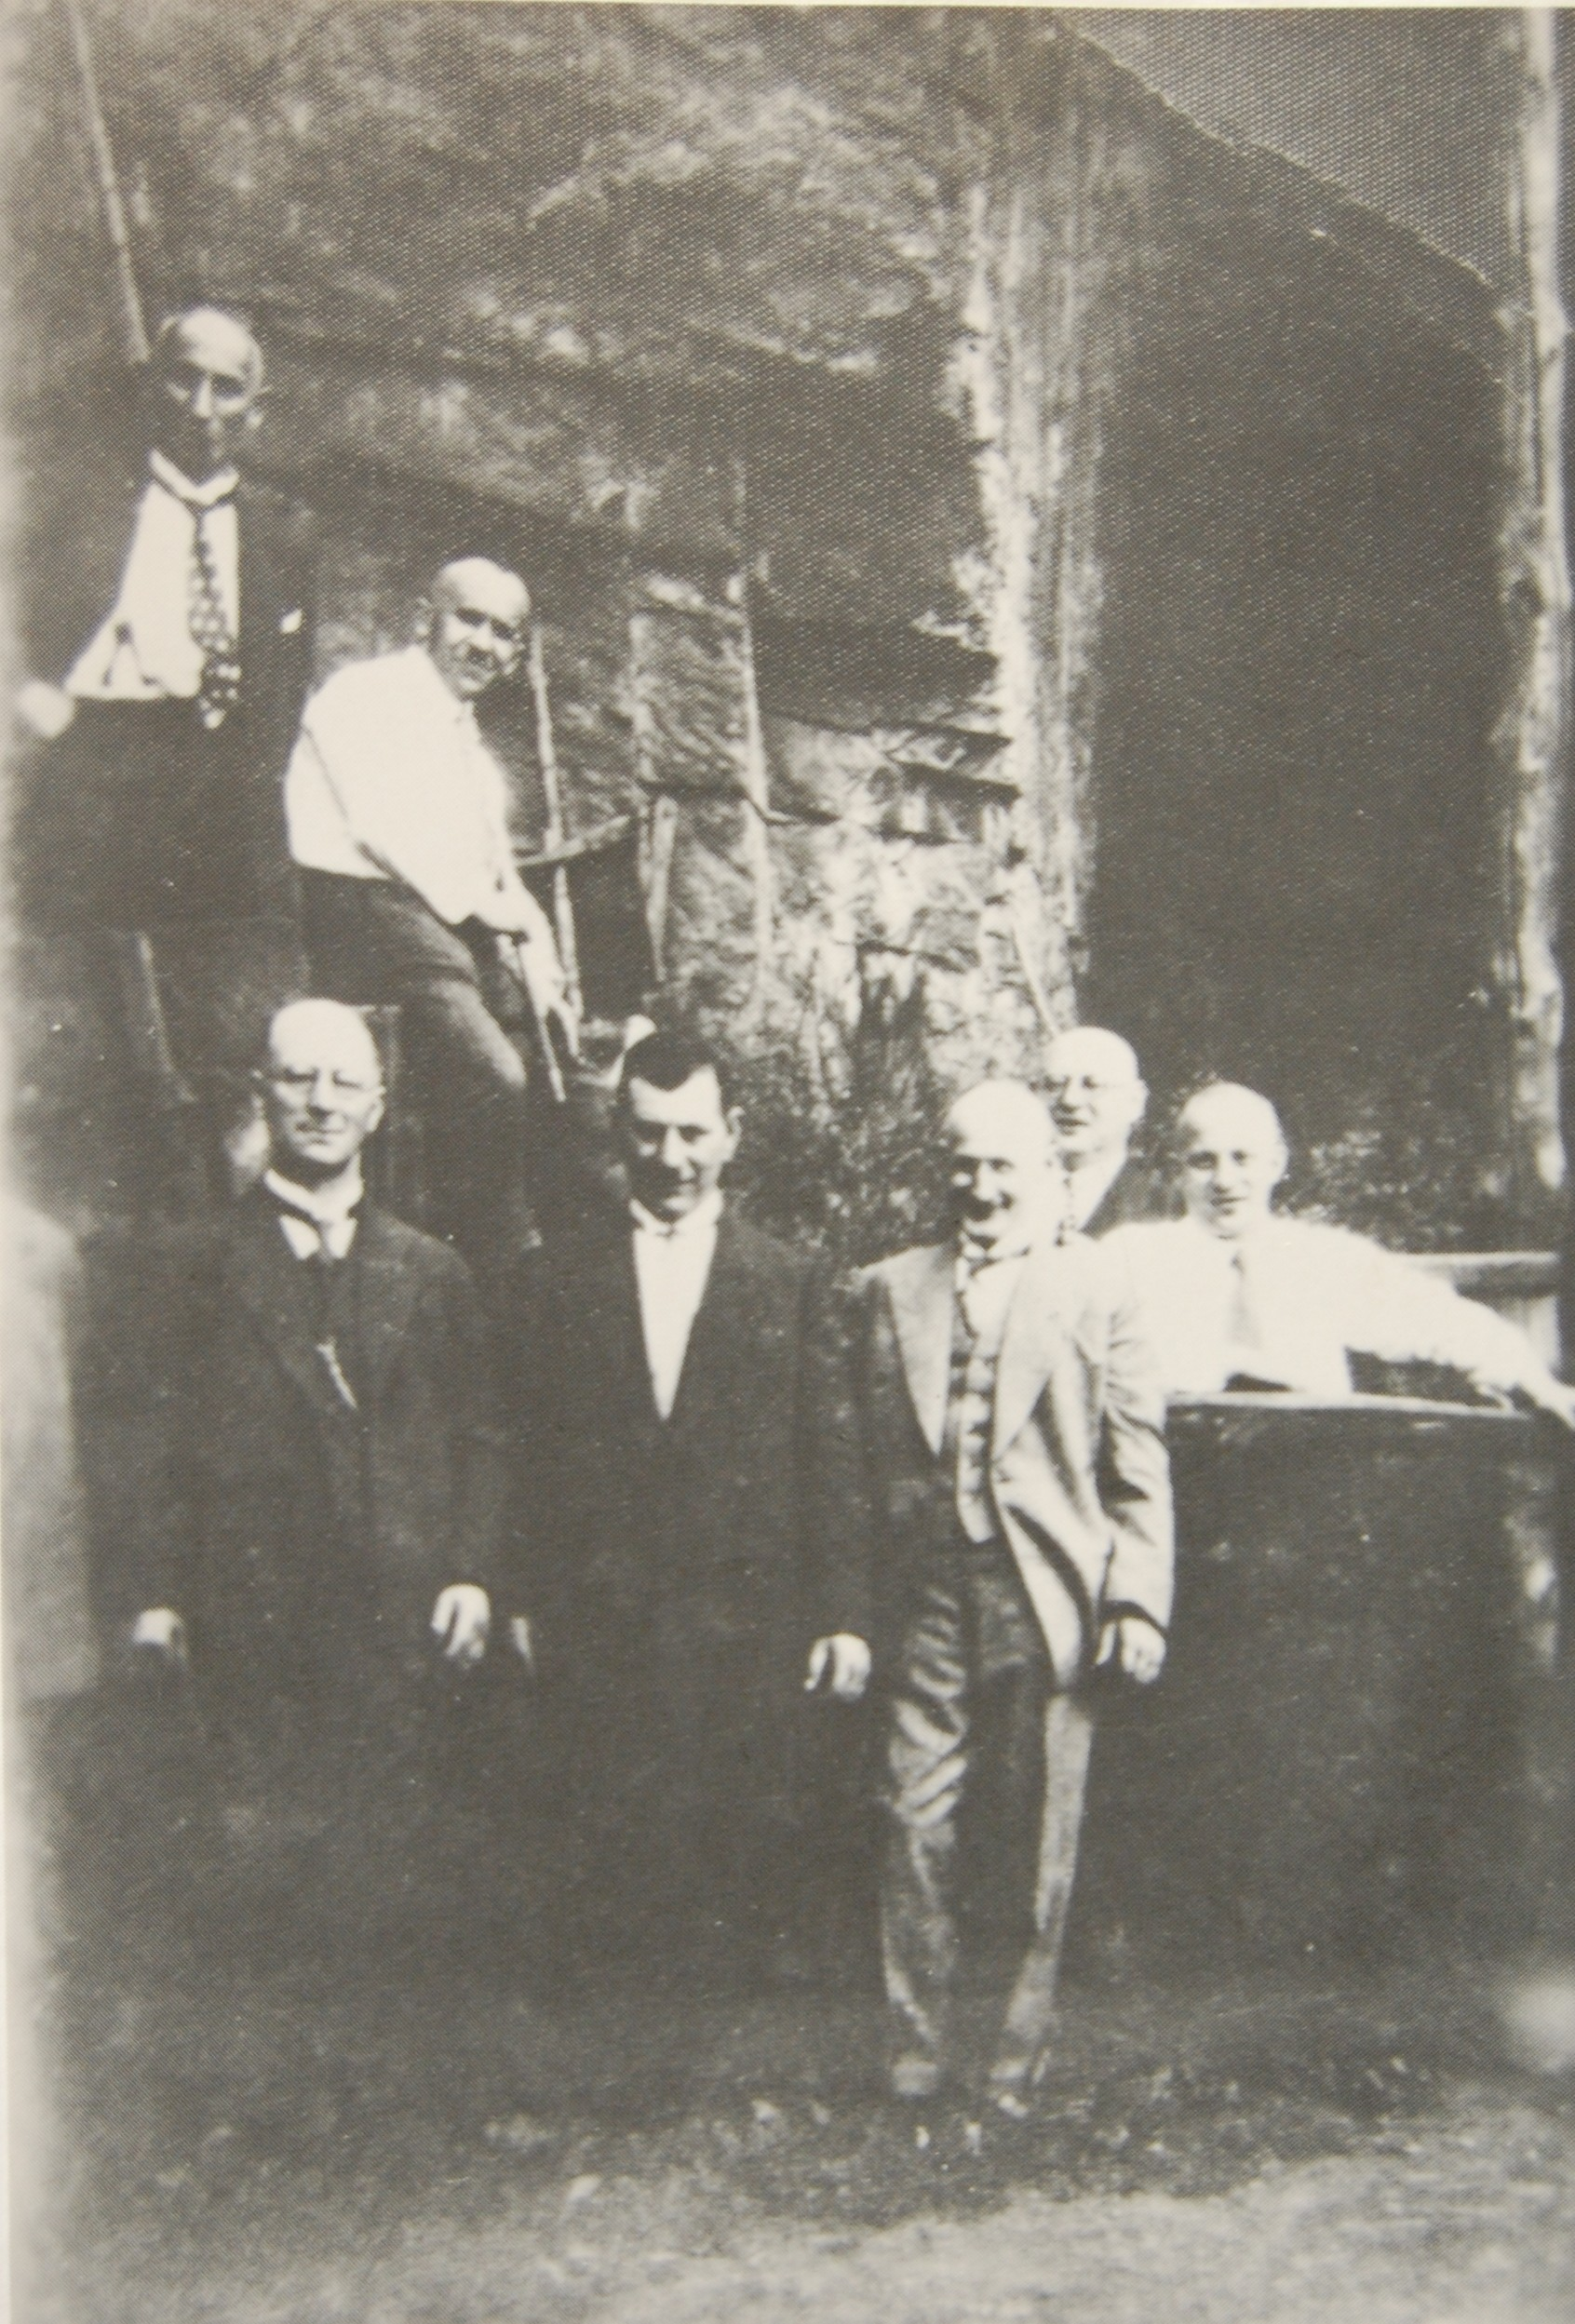 vorn v.l.n.r. Alex, Robert Felix Markus, dahinter v.l.n.r.: Max Burin, David Löwenstein, Isidor und Alfred Heumann (Archiv Möllers)